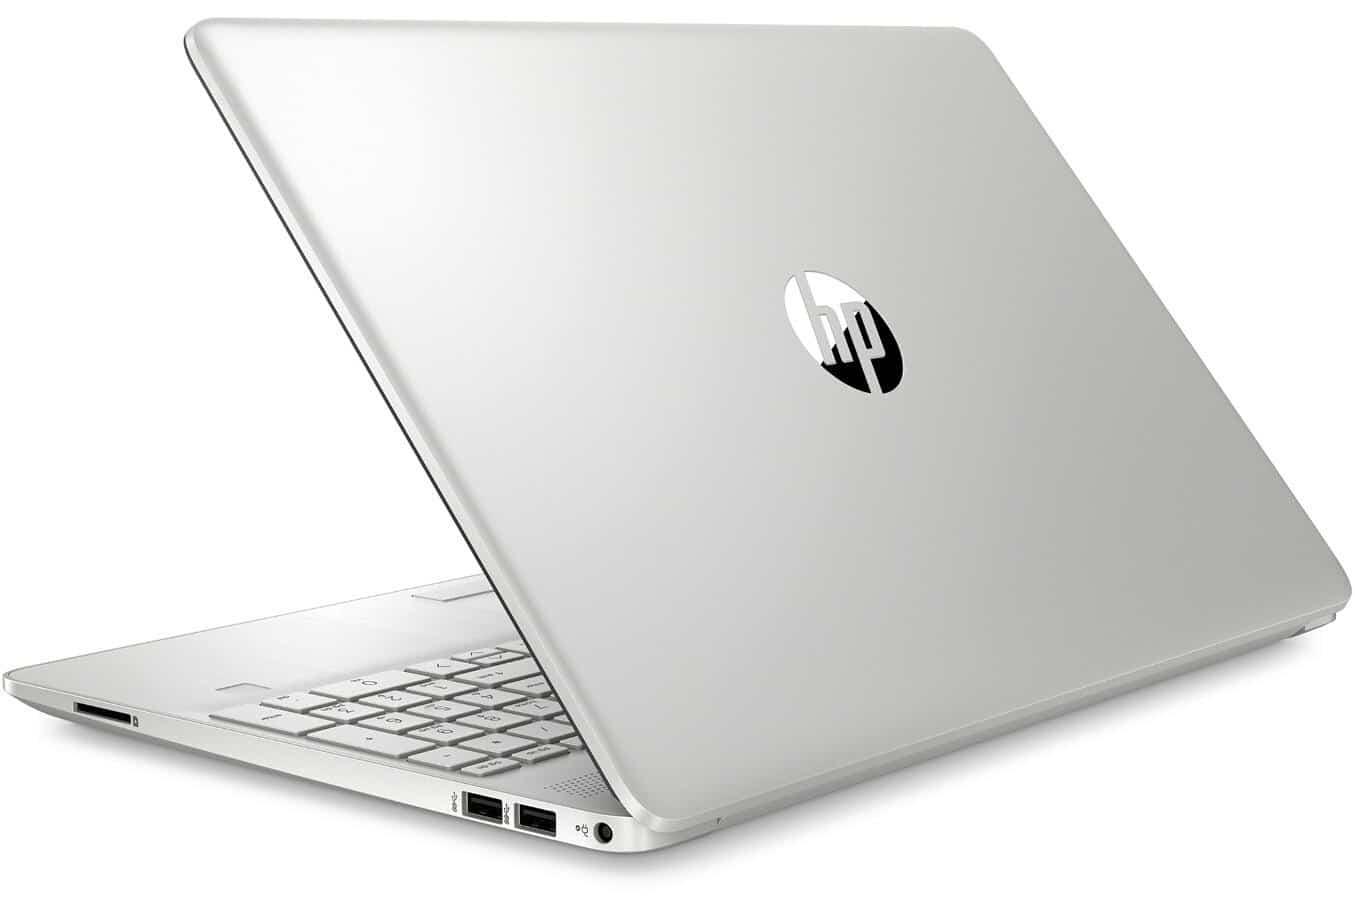 HP 15-dw0052nf, ultrabook 15 pouces multimédia IPS (588€)